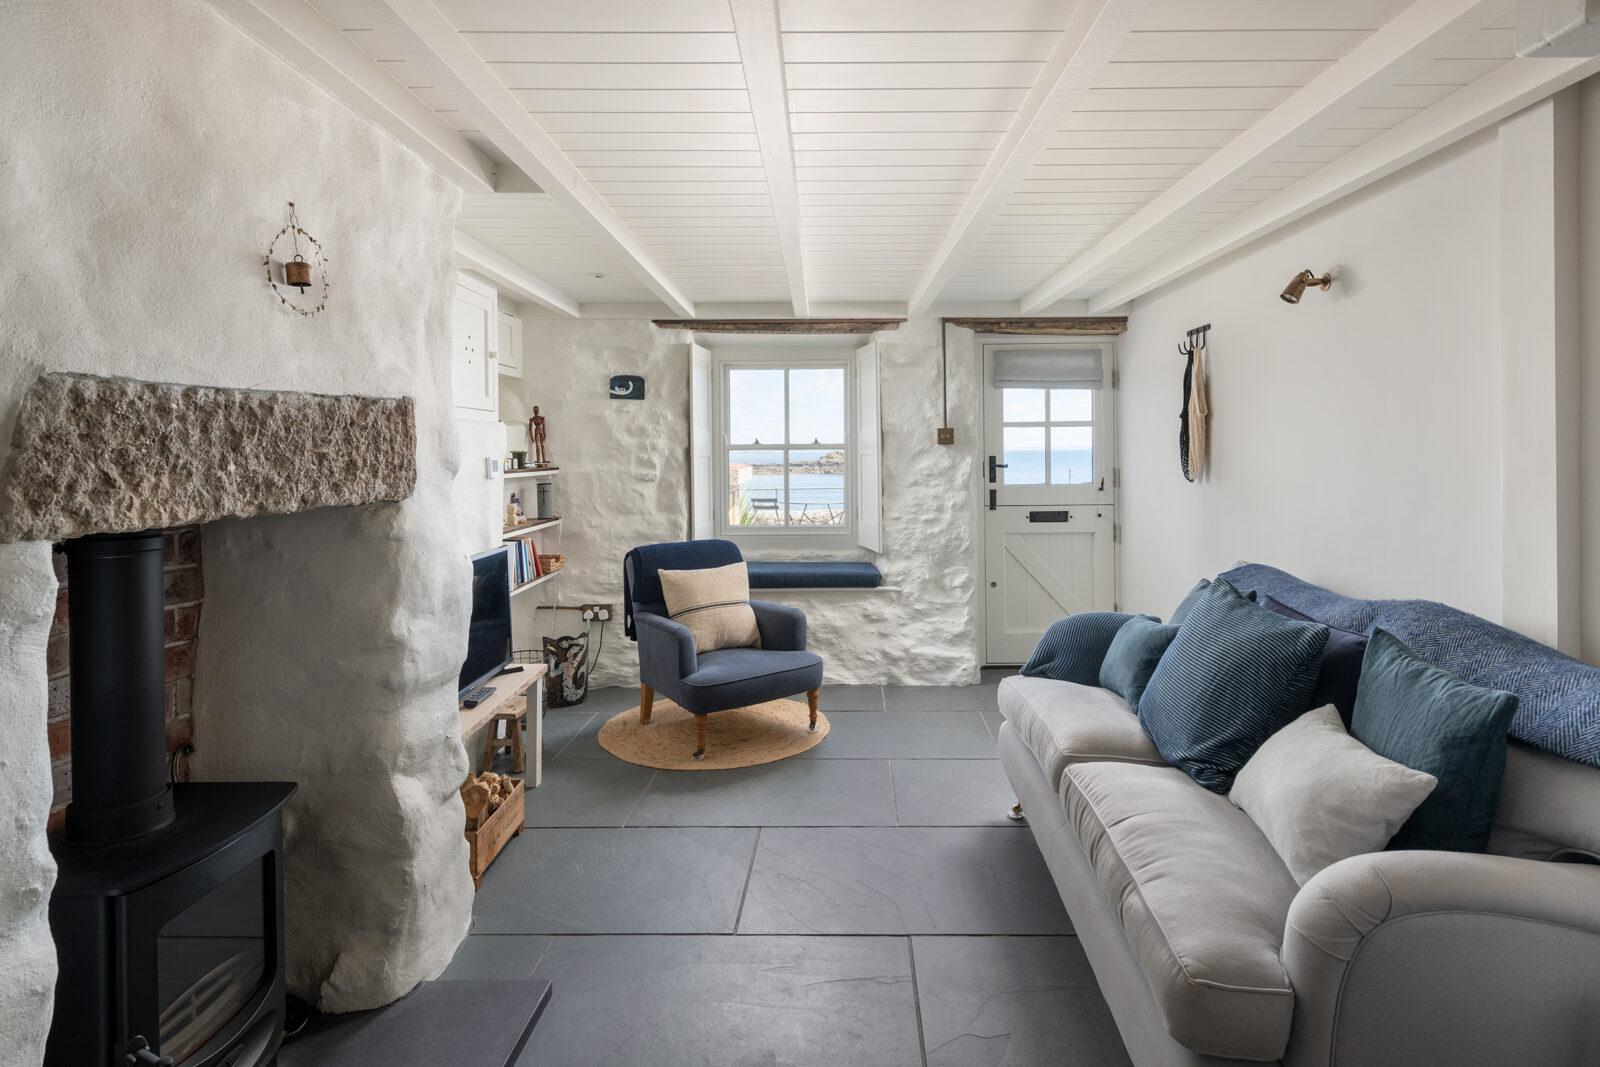 Windows offer views across Mount's Bay